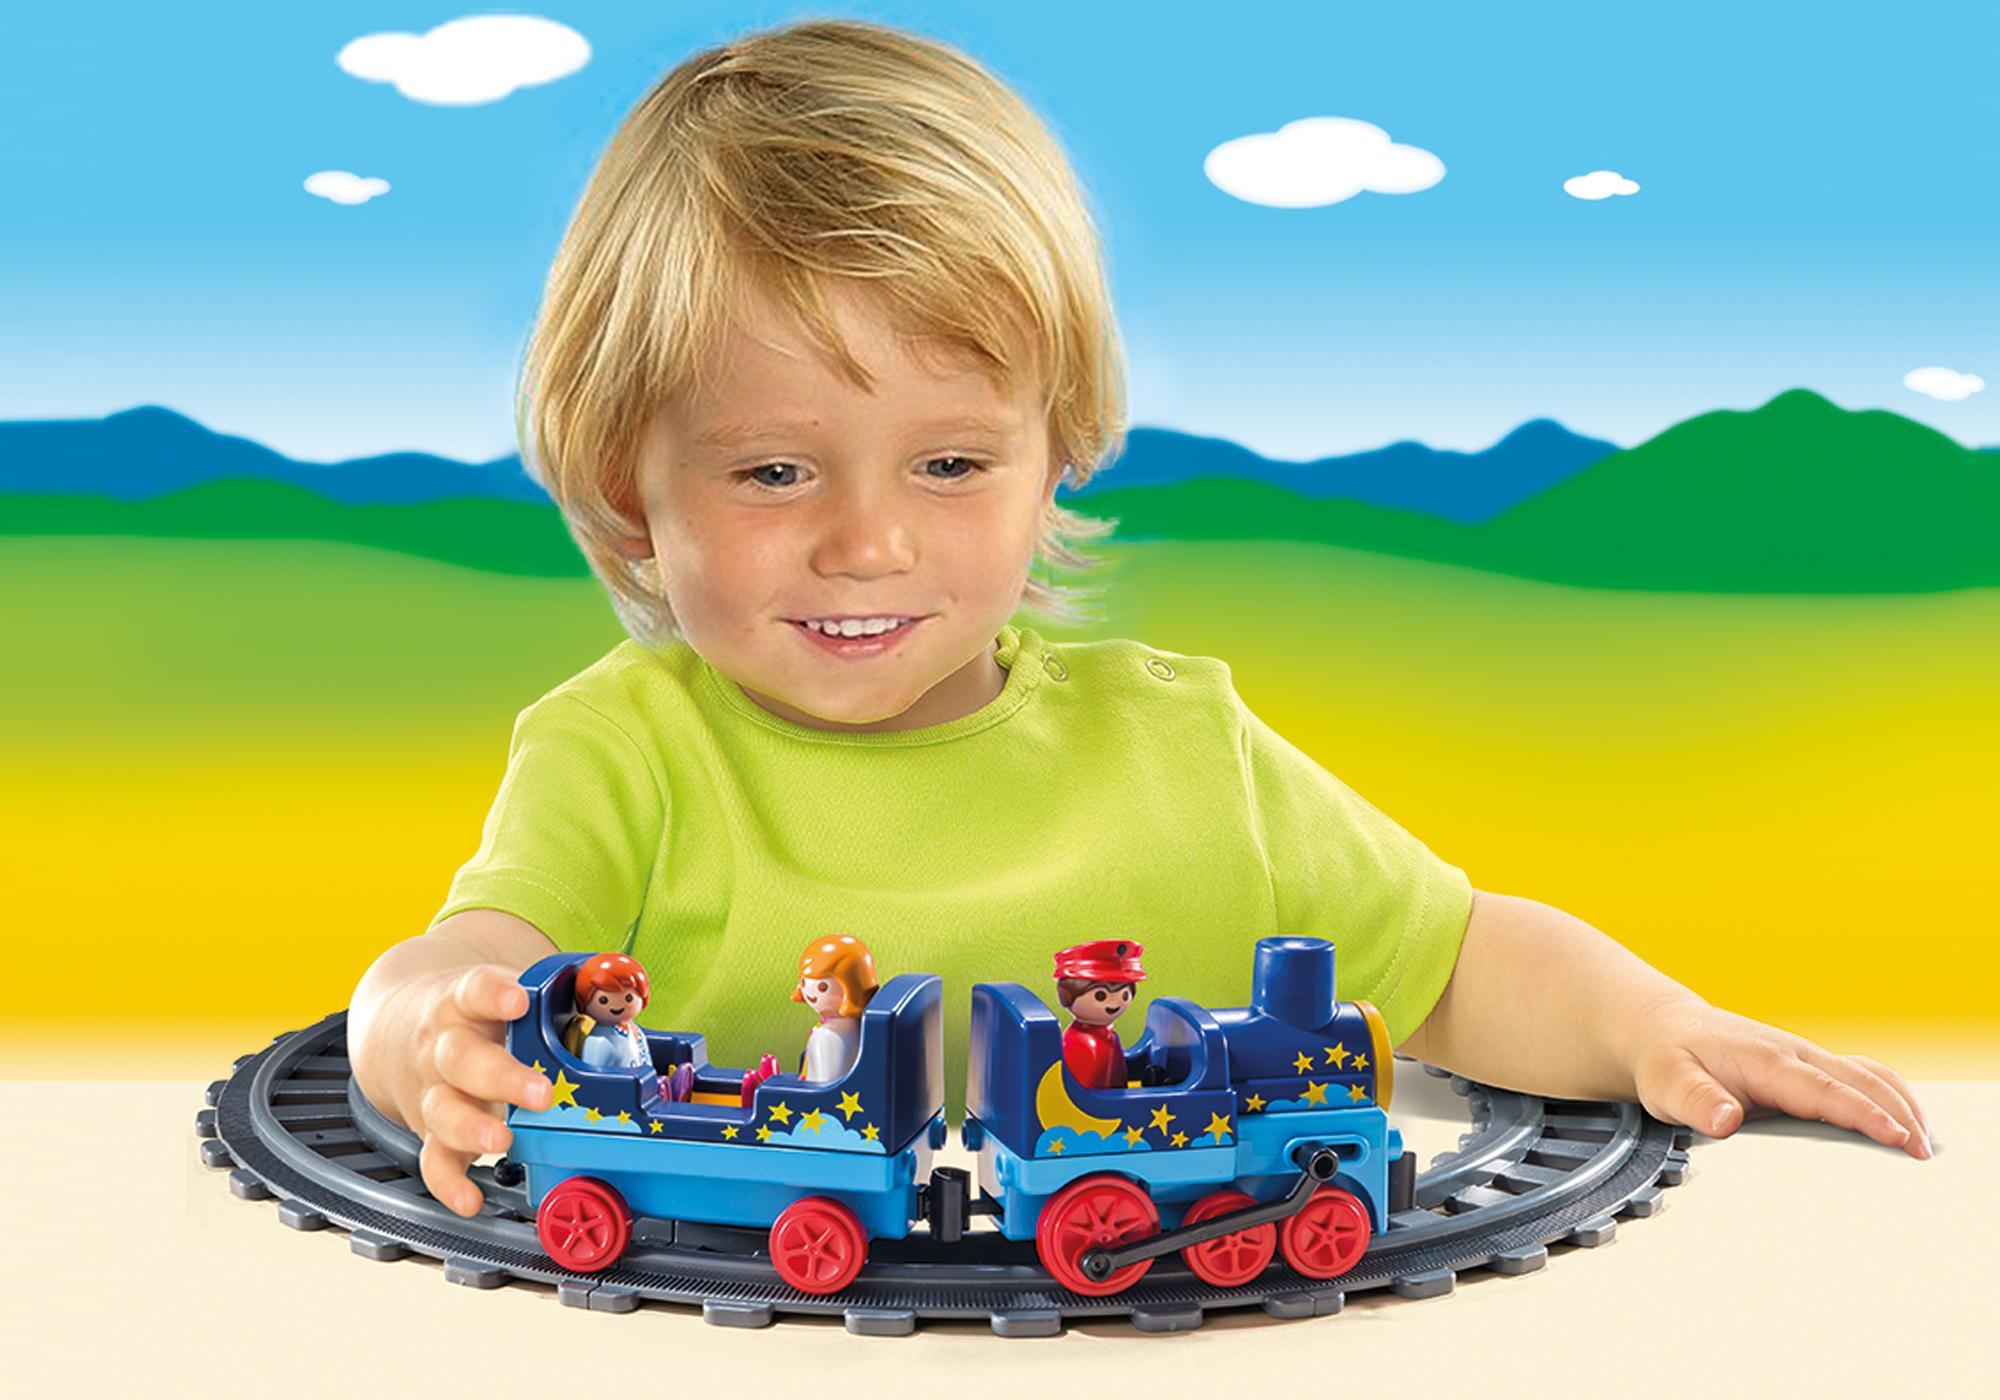 http://media.playmobil.com/i/playmobil/6880_product_extra2/1.2.3 Tren con Vías